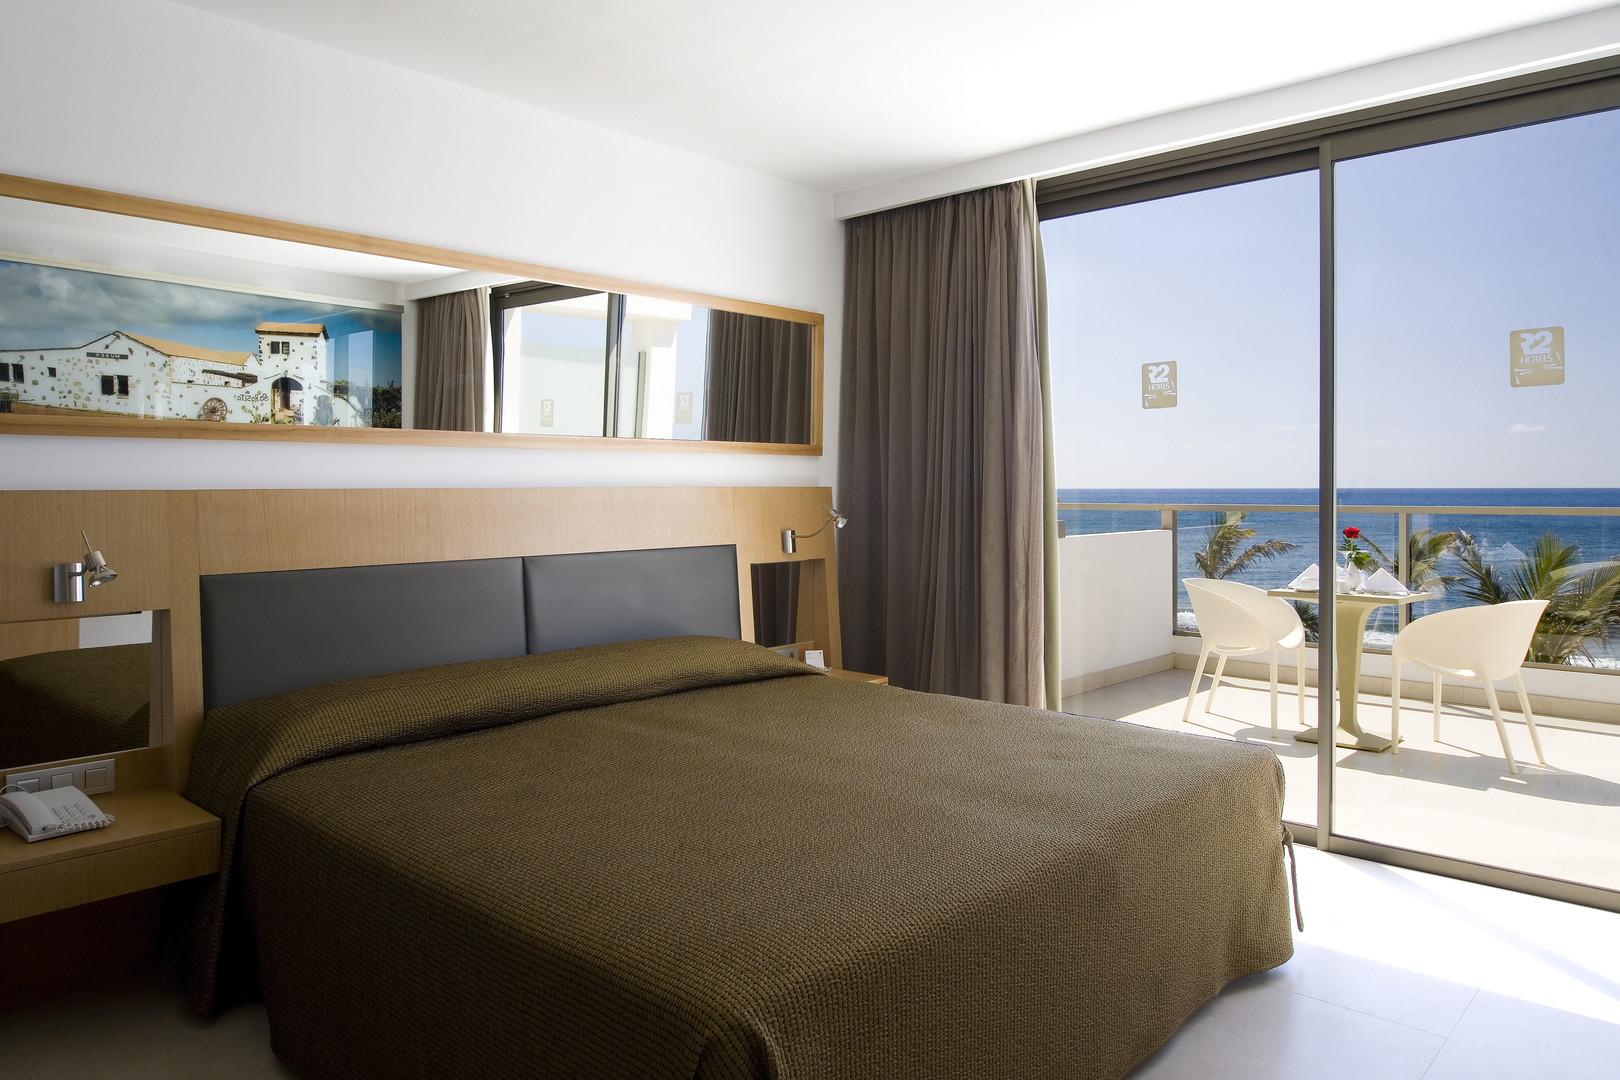 Hotel R2 Bahia Playa Design #4